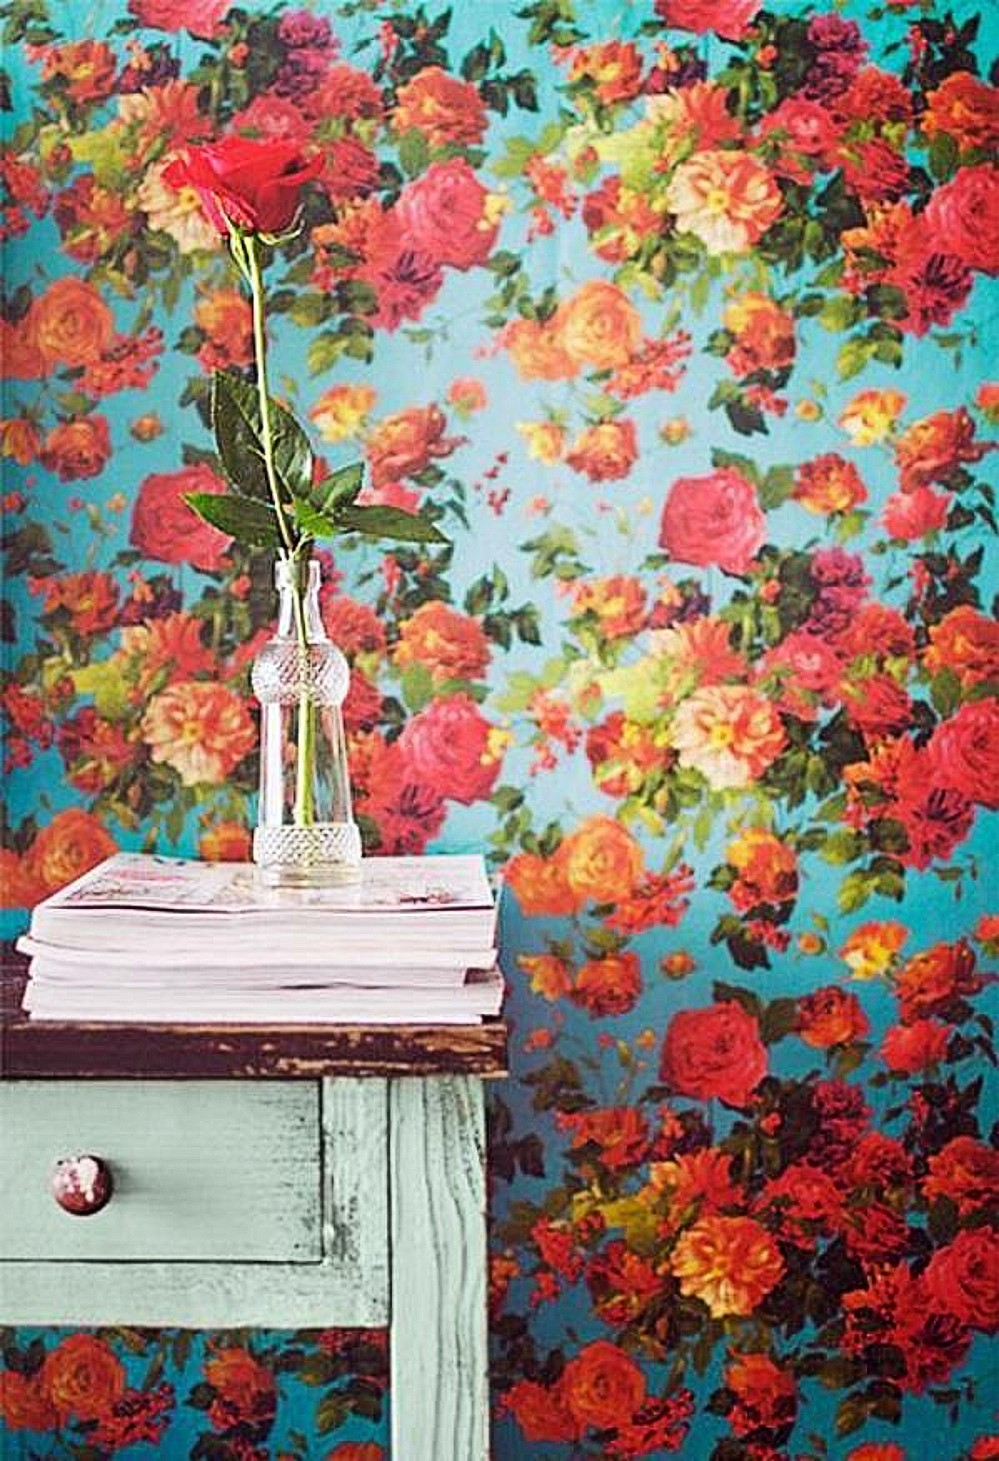 floral wallpaper making a comeback